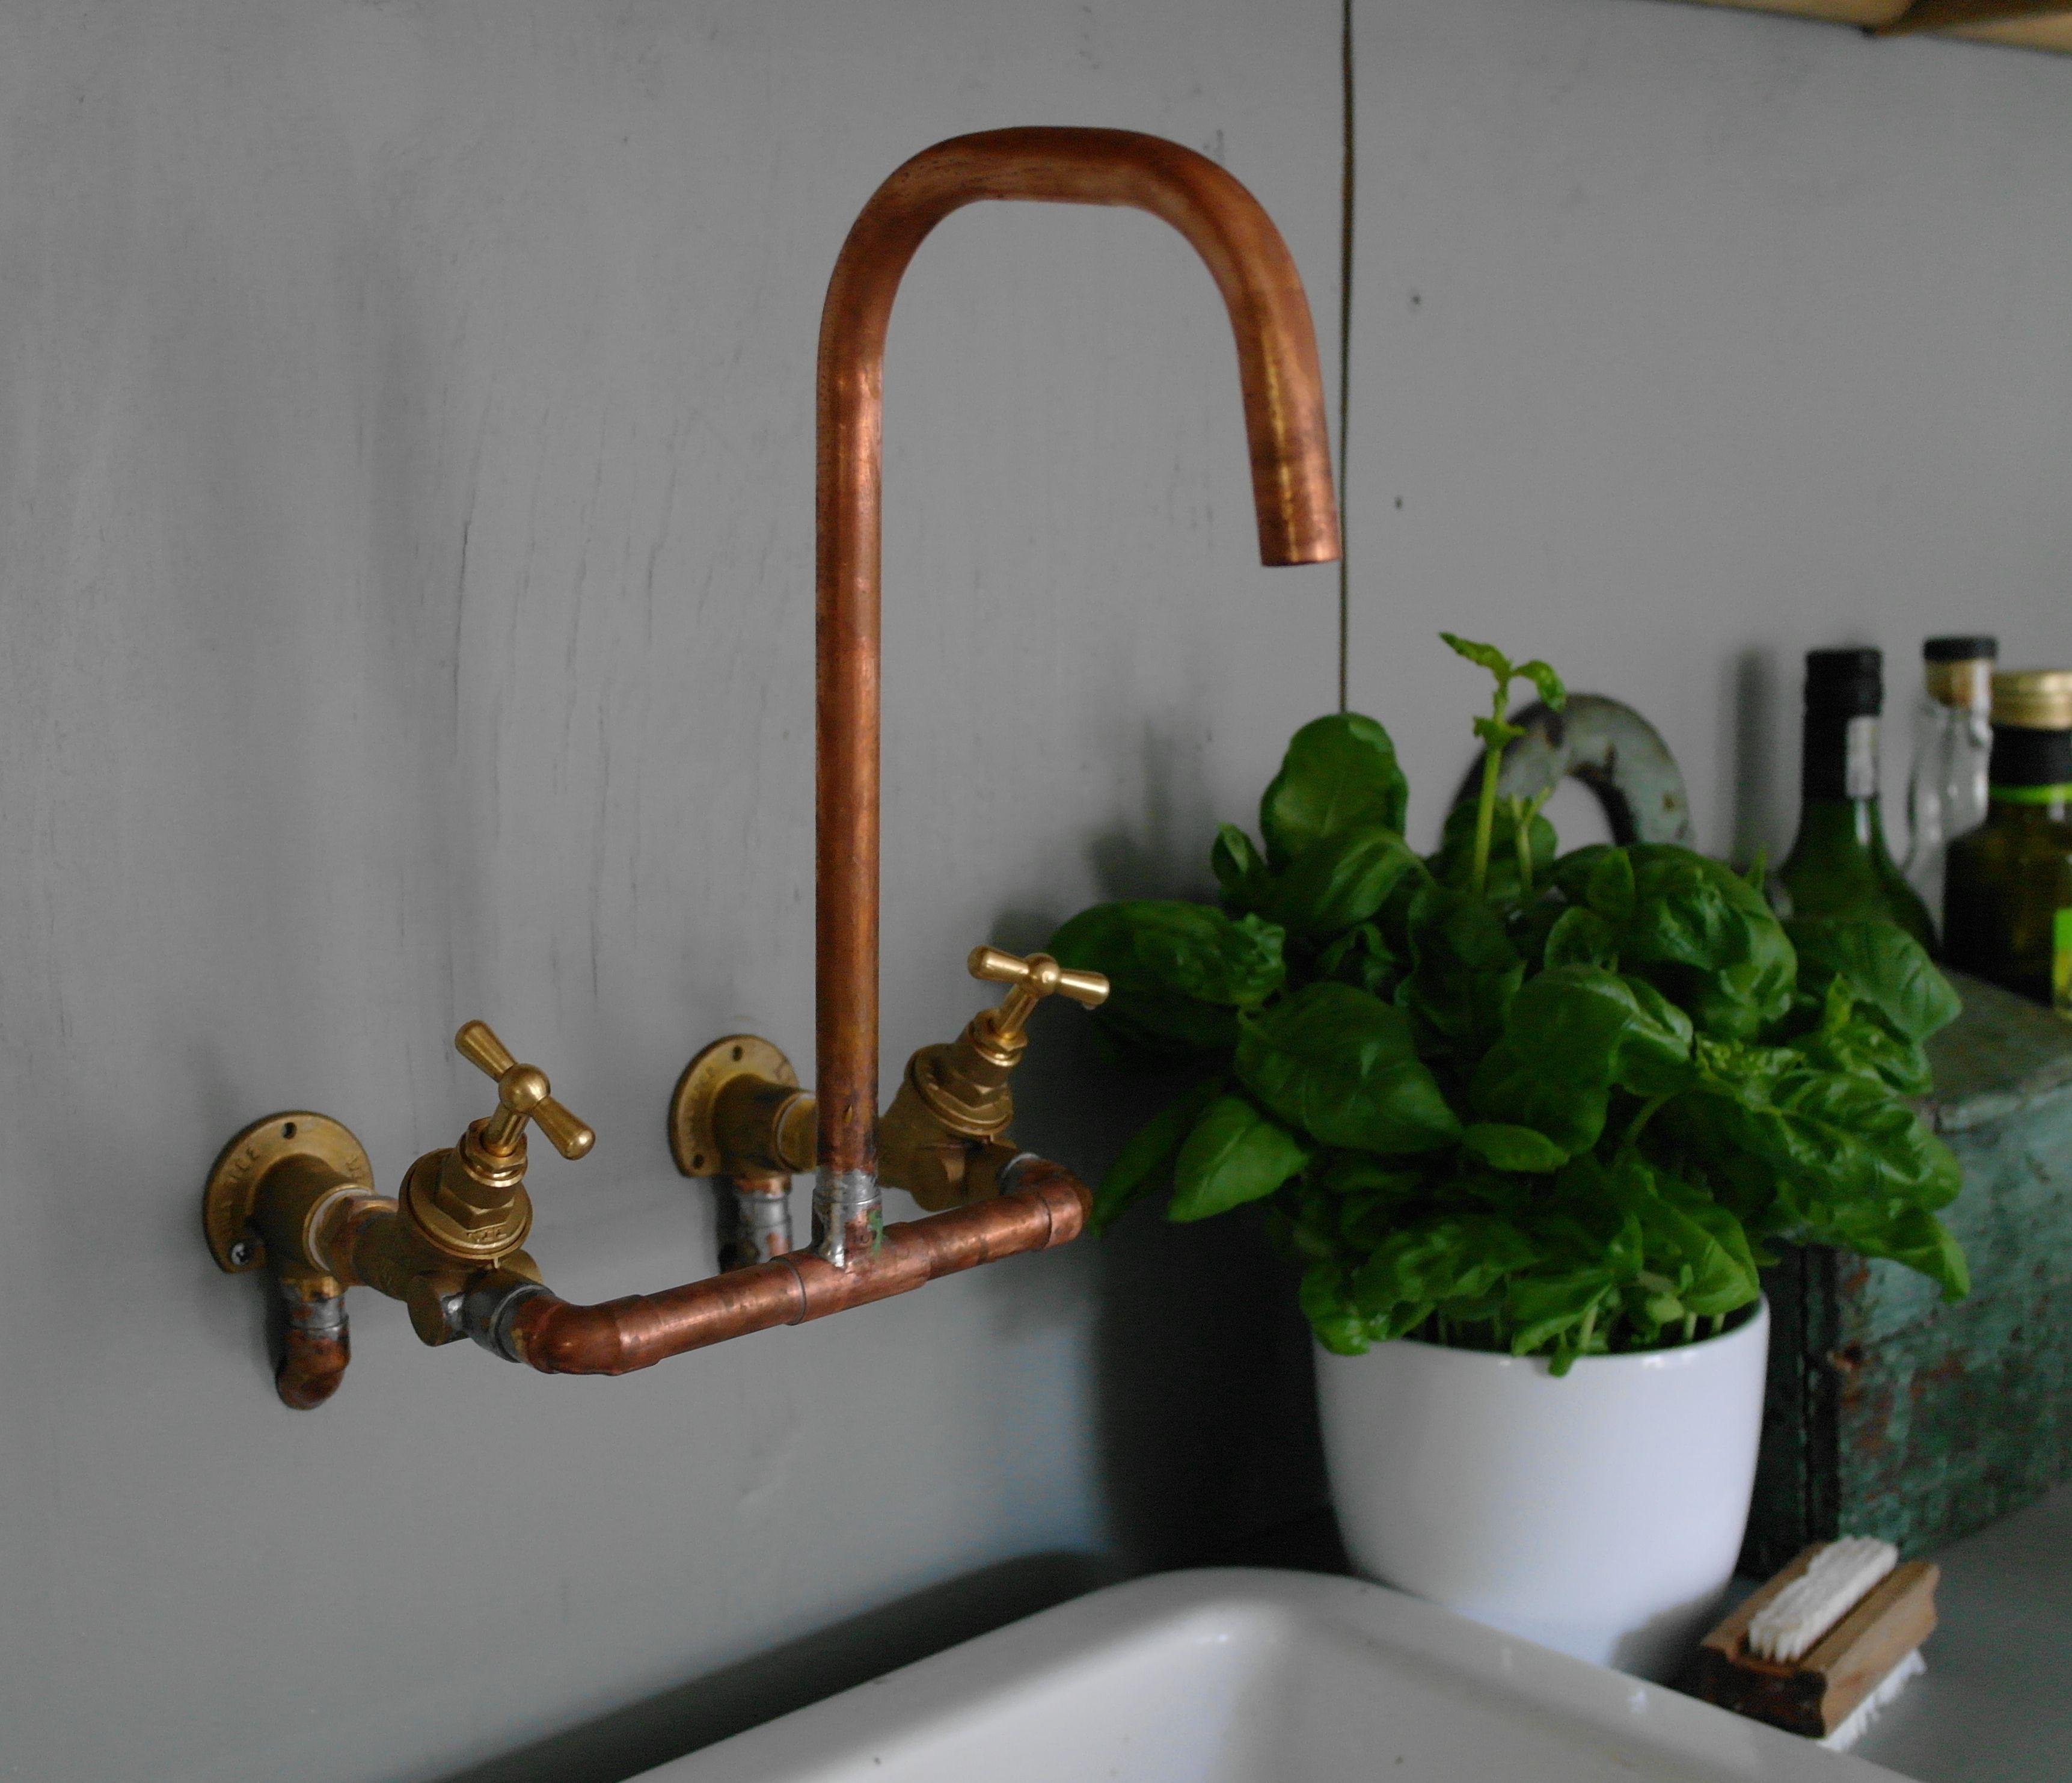 Copper Faucet Above Belfast Sink Standing On Brick Base Badezimmerarmatur Armaturen Bad Kupfer Badezimmer